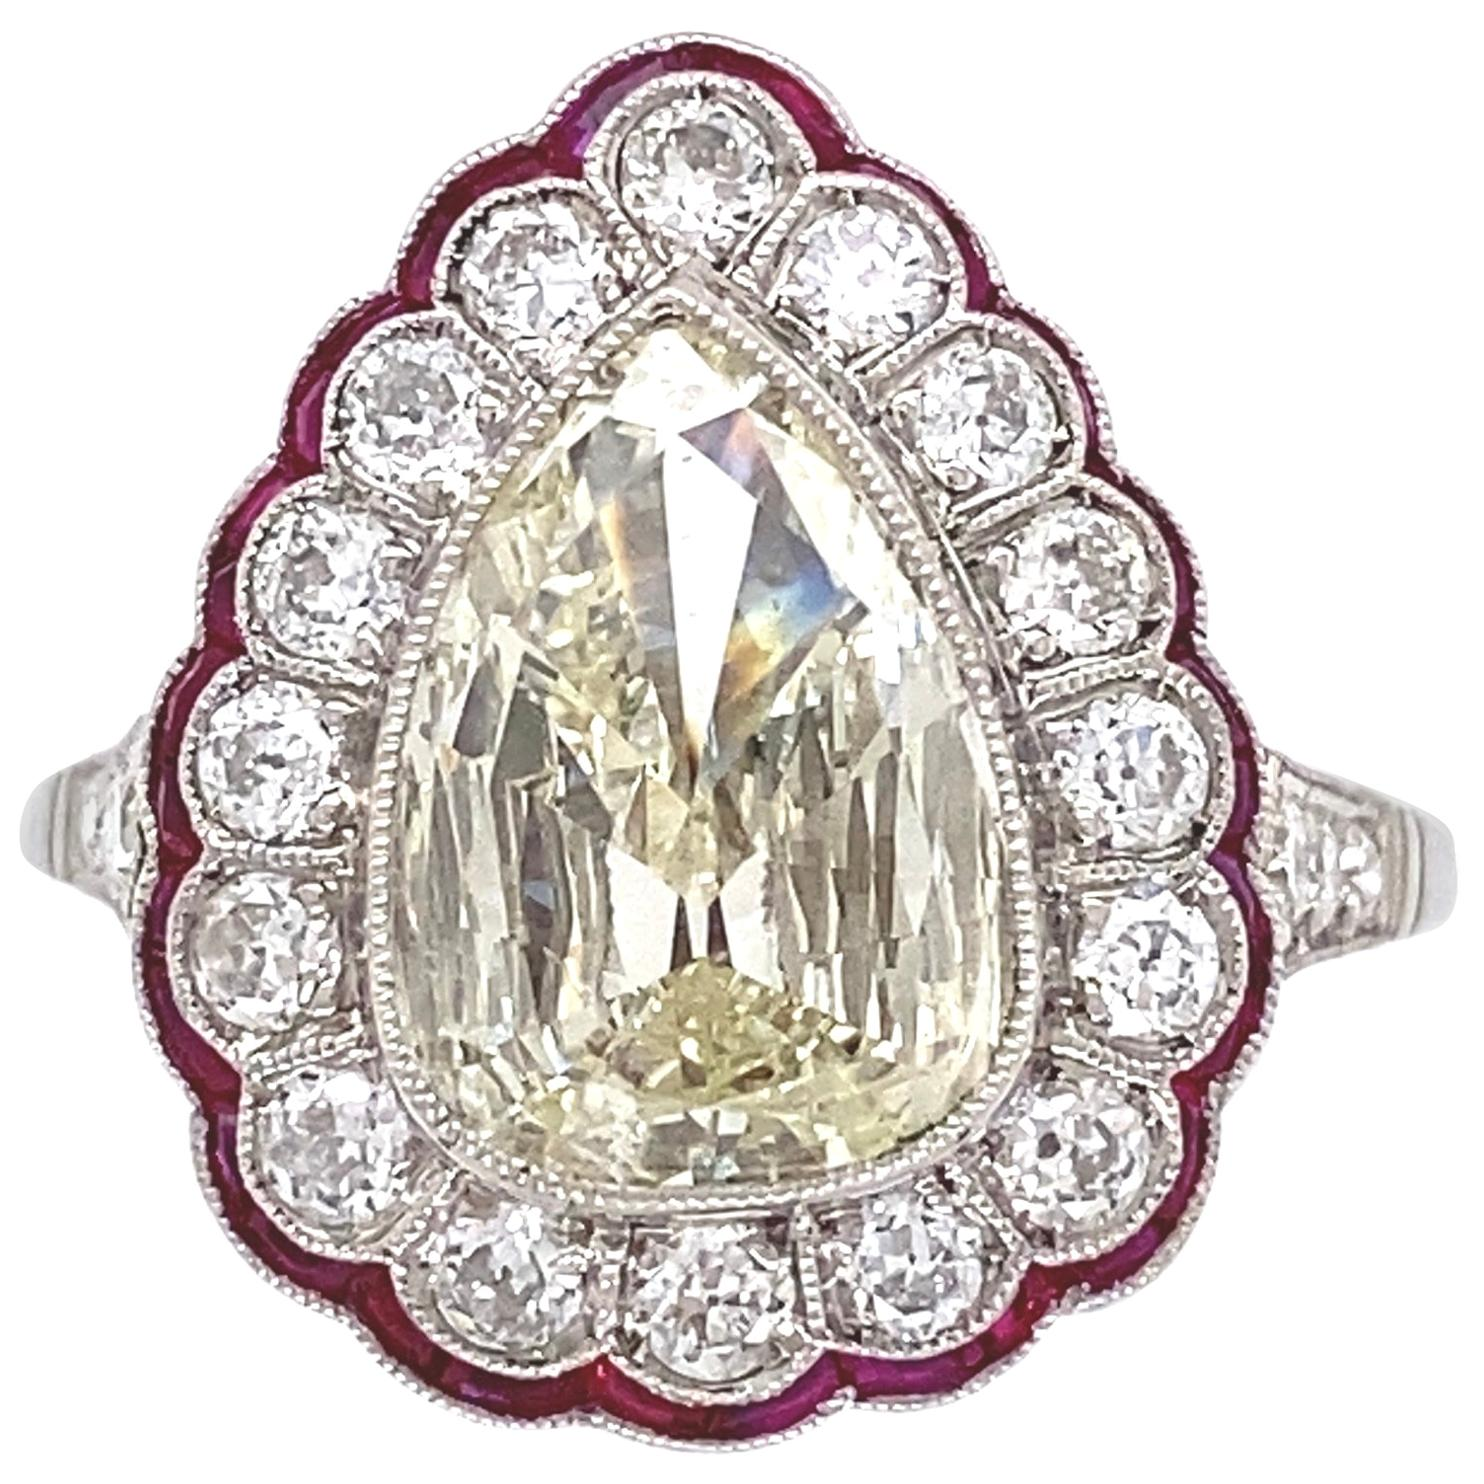 1.75 Carat Pear Diamond and Rubies Platinum Cocktail Ring Estate Fine Jewelry